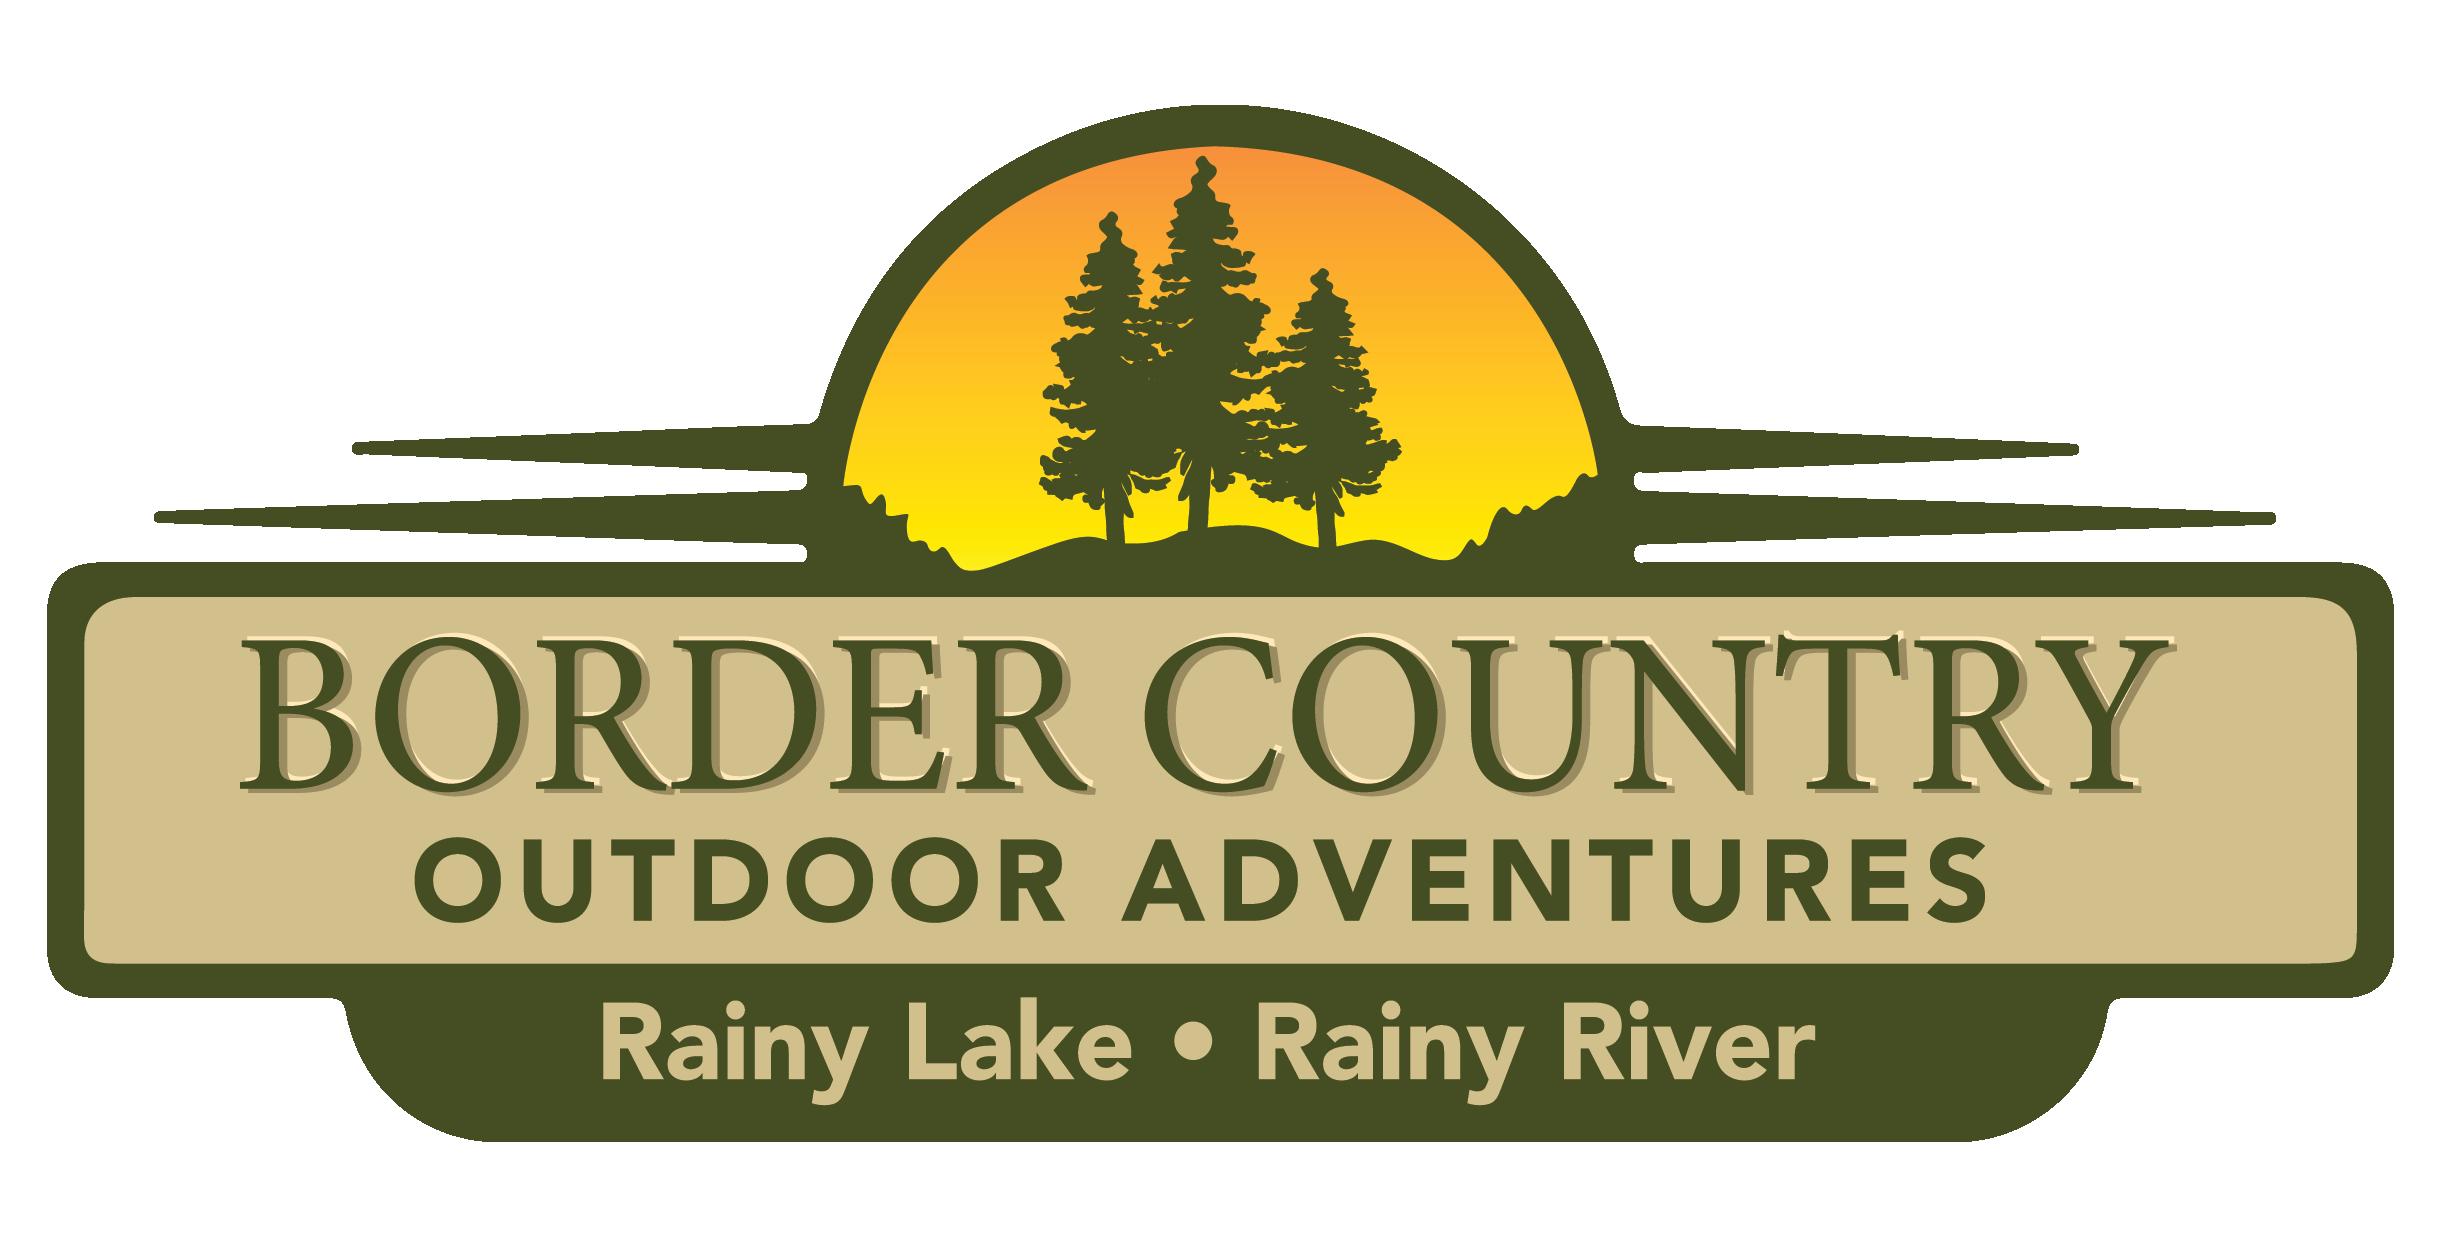 Border Country Outdoor Adventures